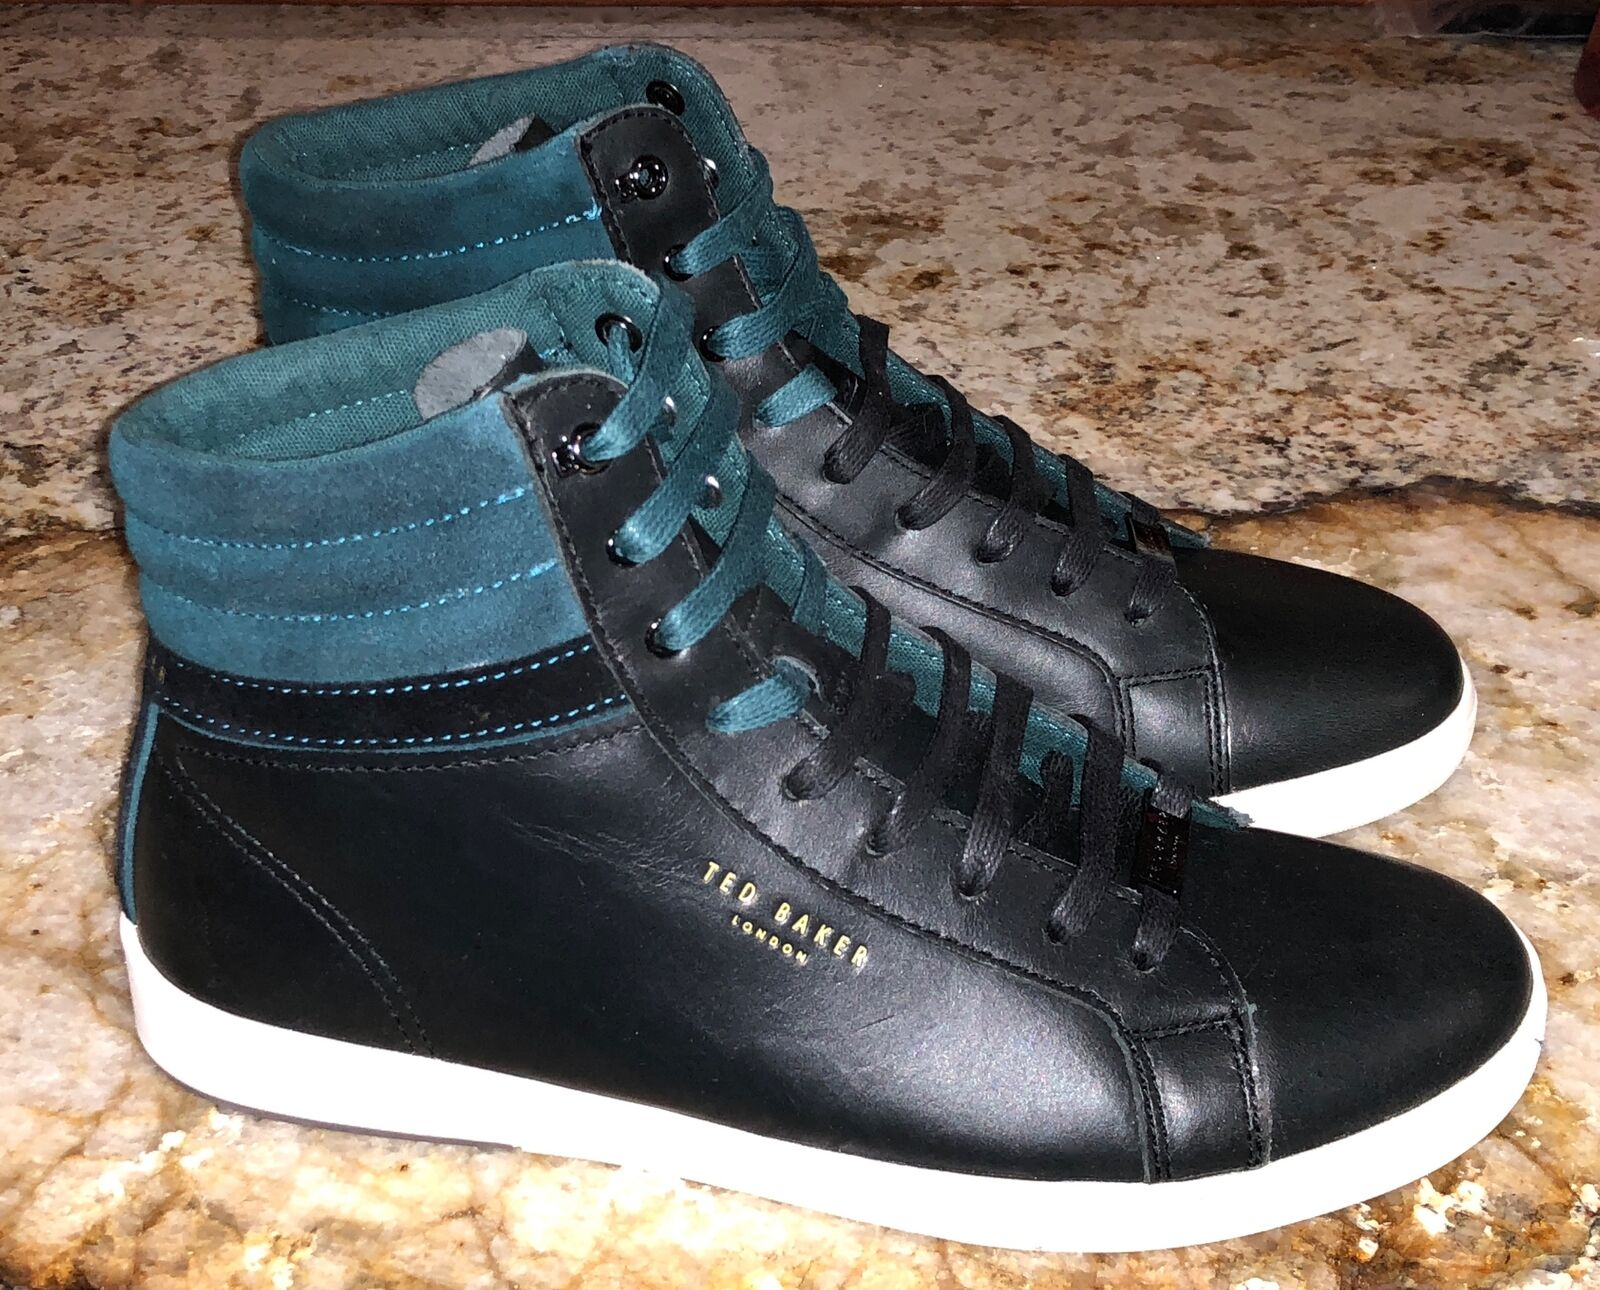 TED BAKER Kilma Leather Leather Leather Suede High Top nero Teal scarpe da ginnastica scarpe Uomo 10 9.5 2272bb